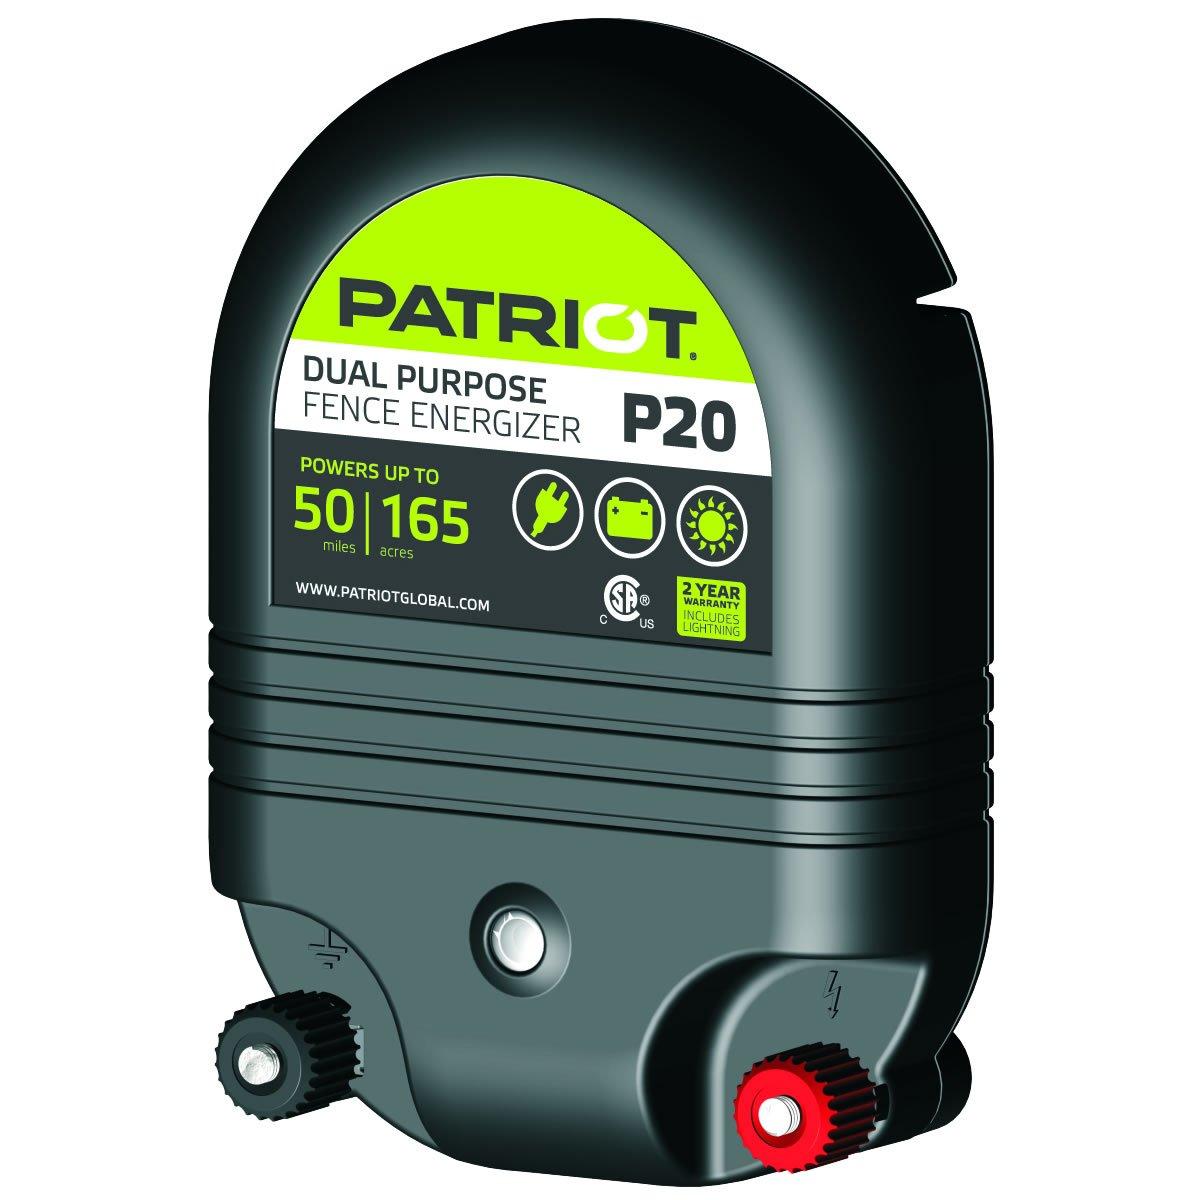 Patriot P20 Dual Purpose Electric Fence Energizer, 2.0 Joule